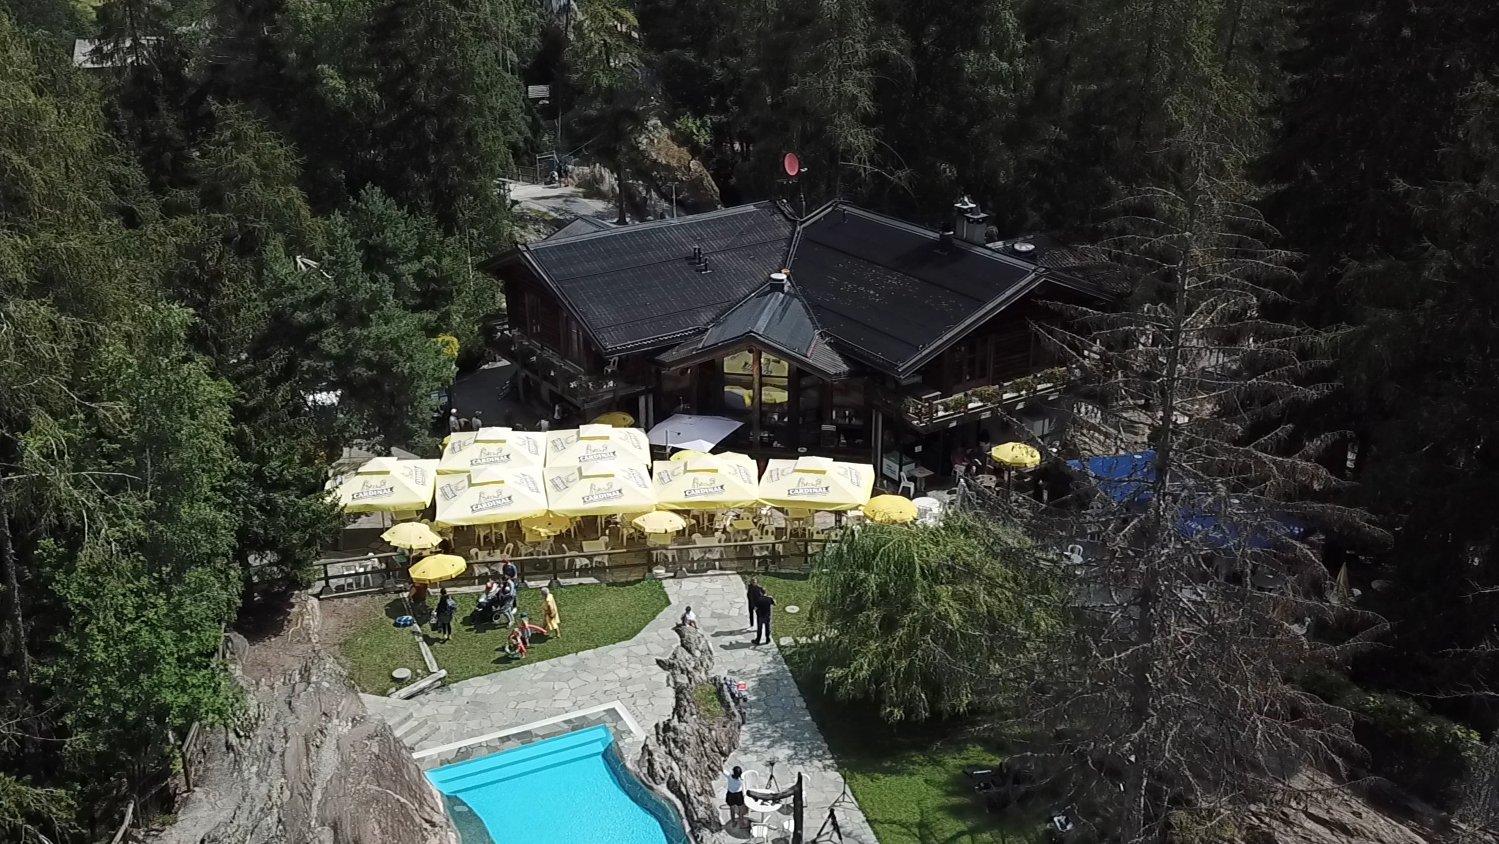 Restaurant Le Zoo